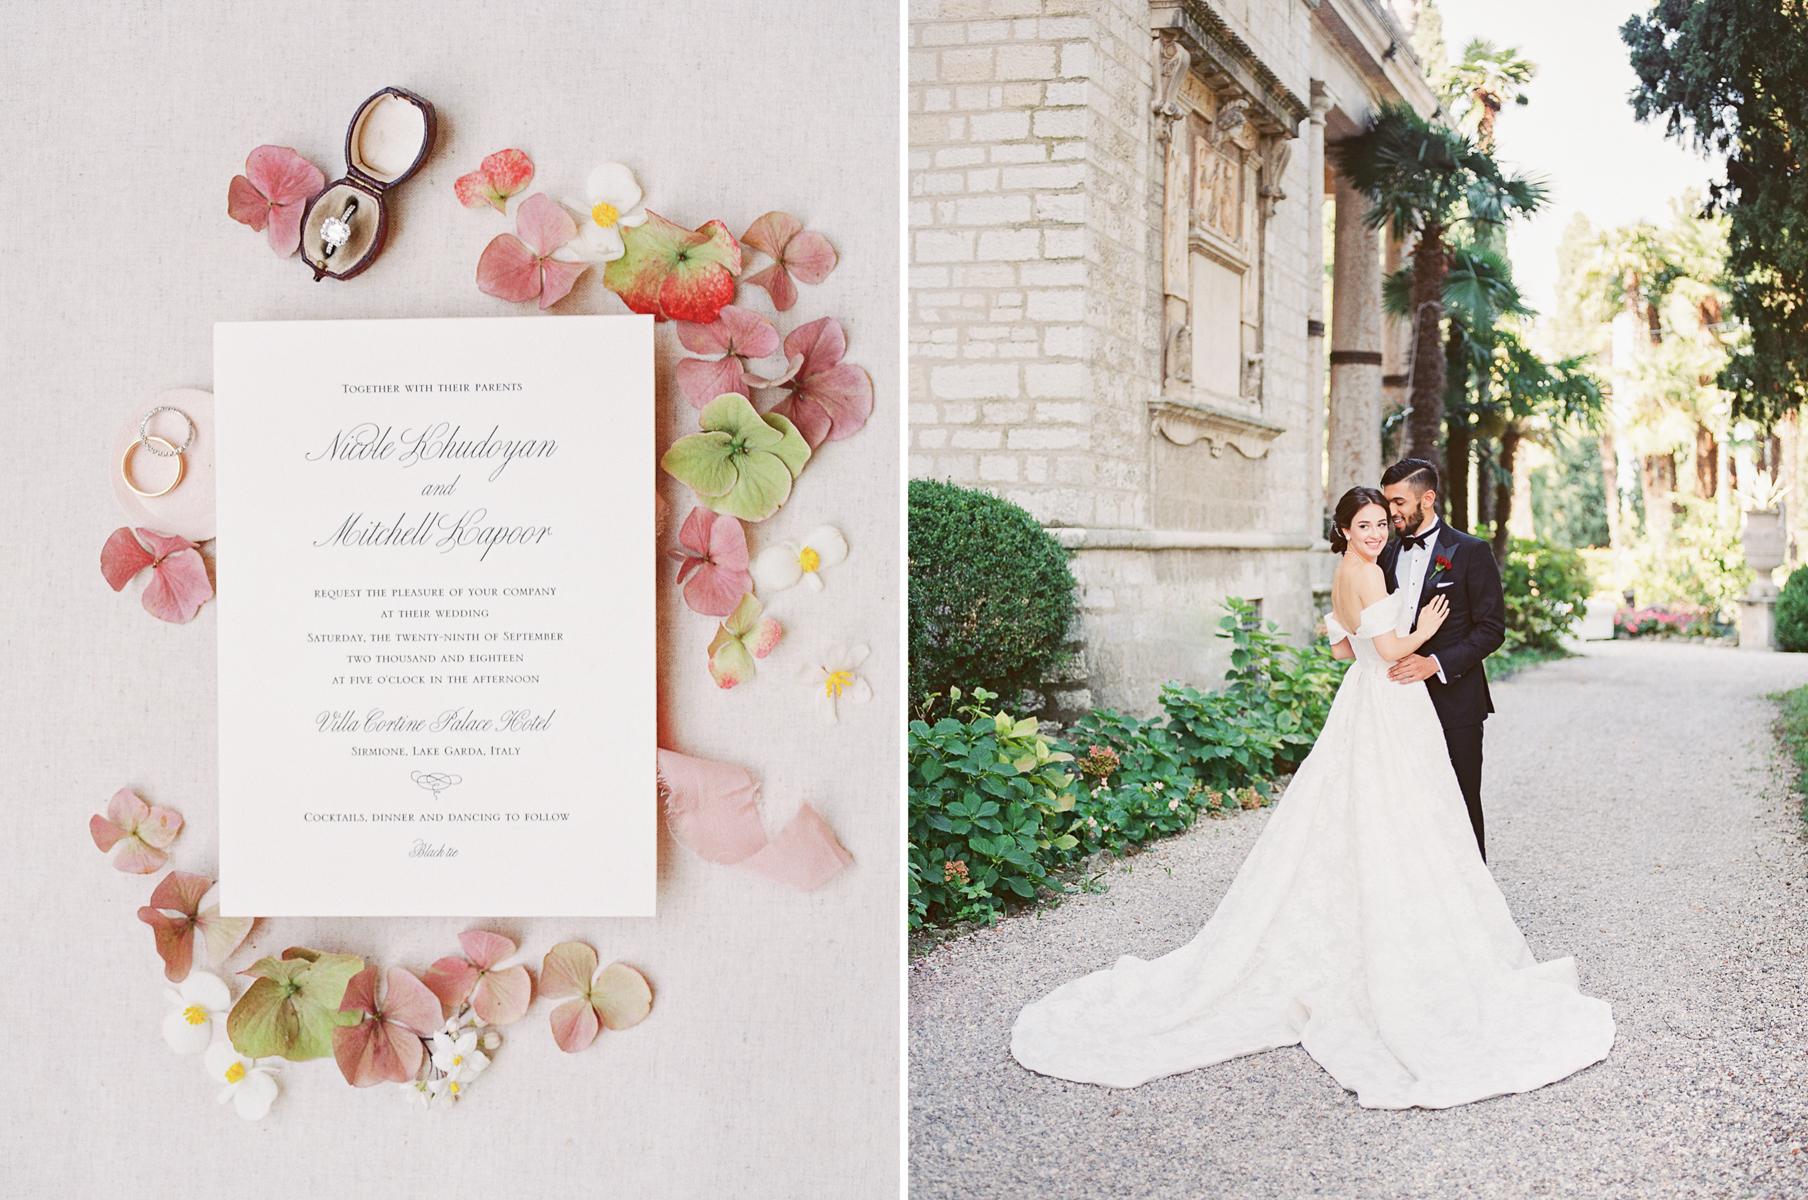 Palace_Villa_Cortine_Hotel_Italian_Wedding_Photographer_Sirmione_AKP-10-Nicole_Khudoyan_Mitchell_Kapoor.jpg